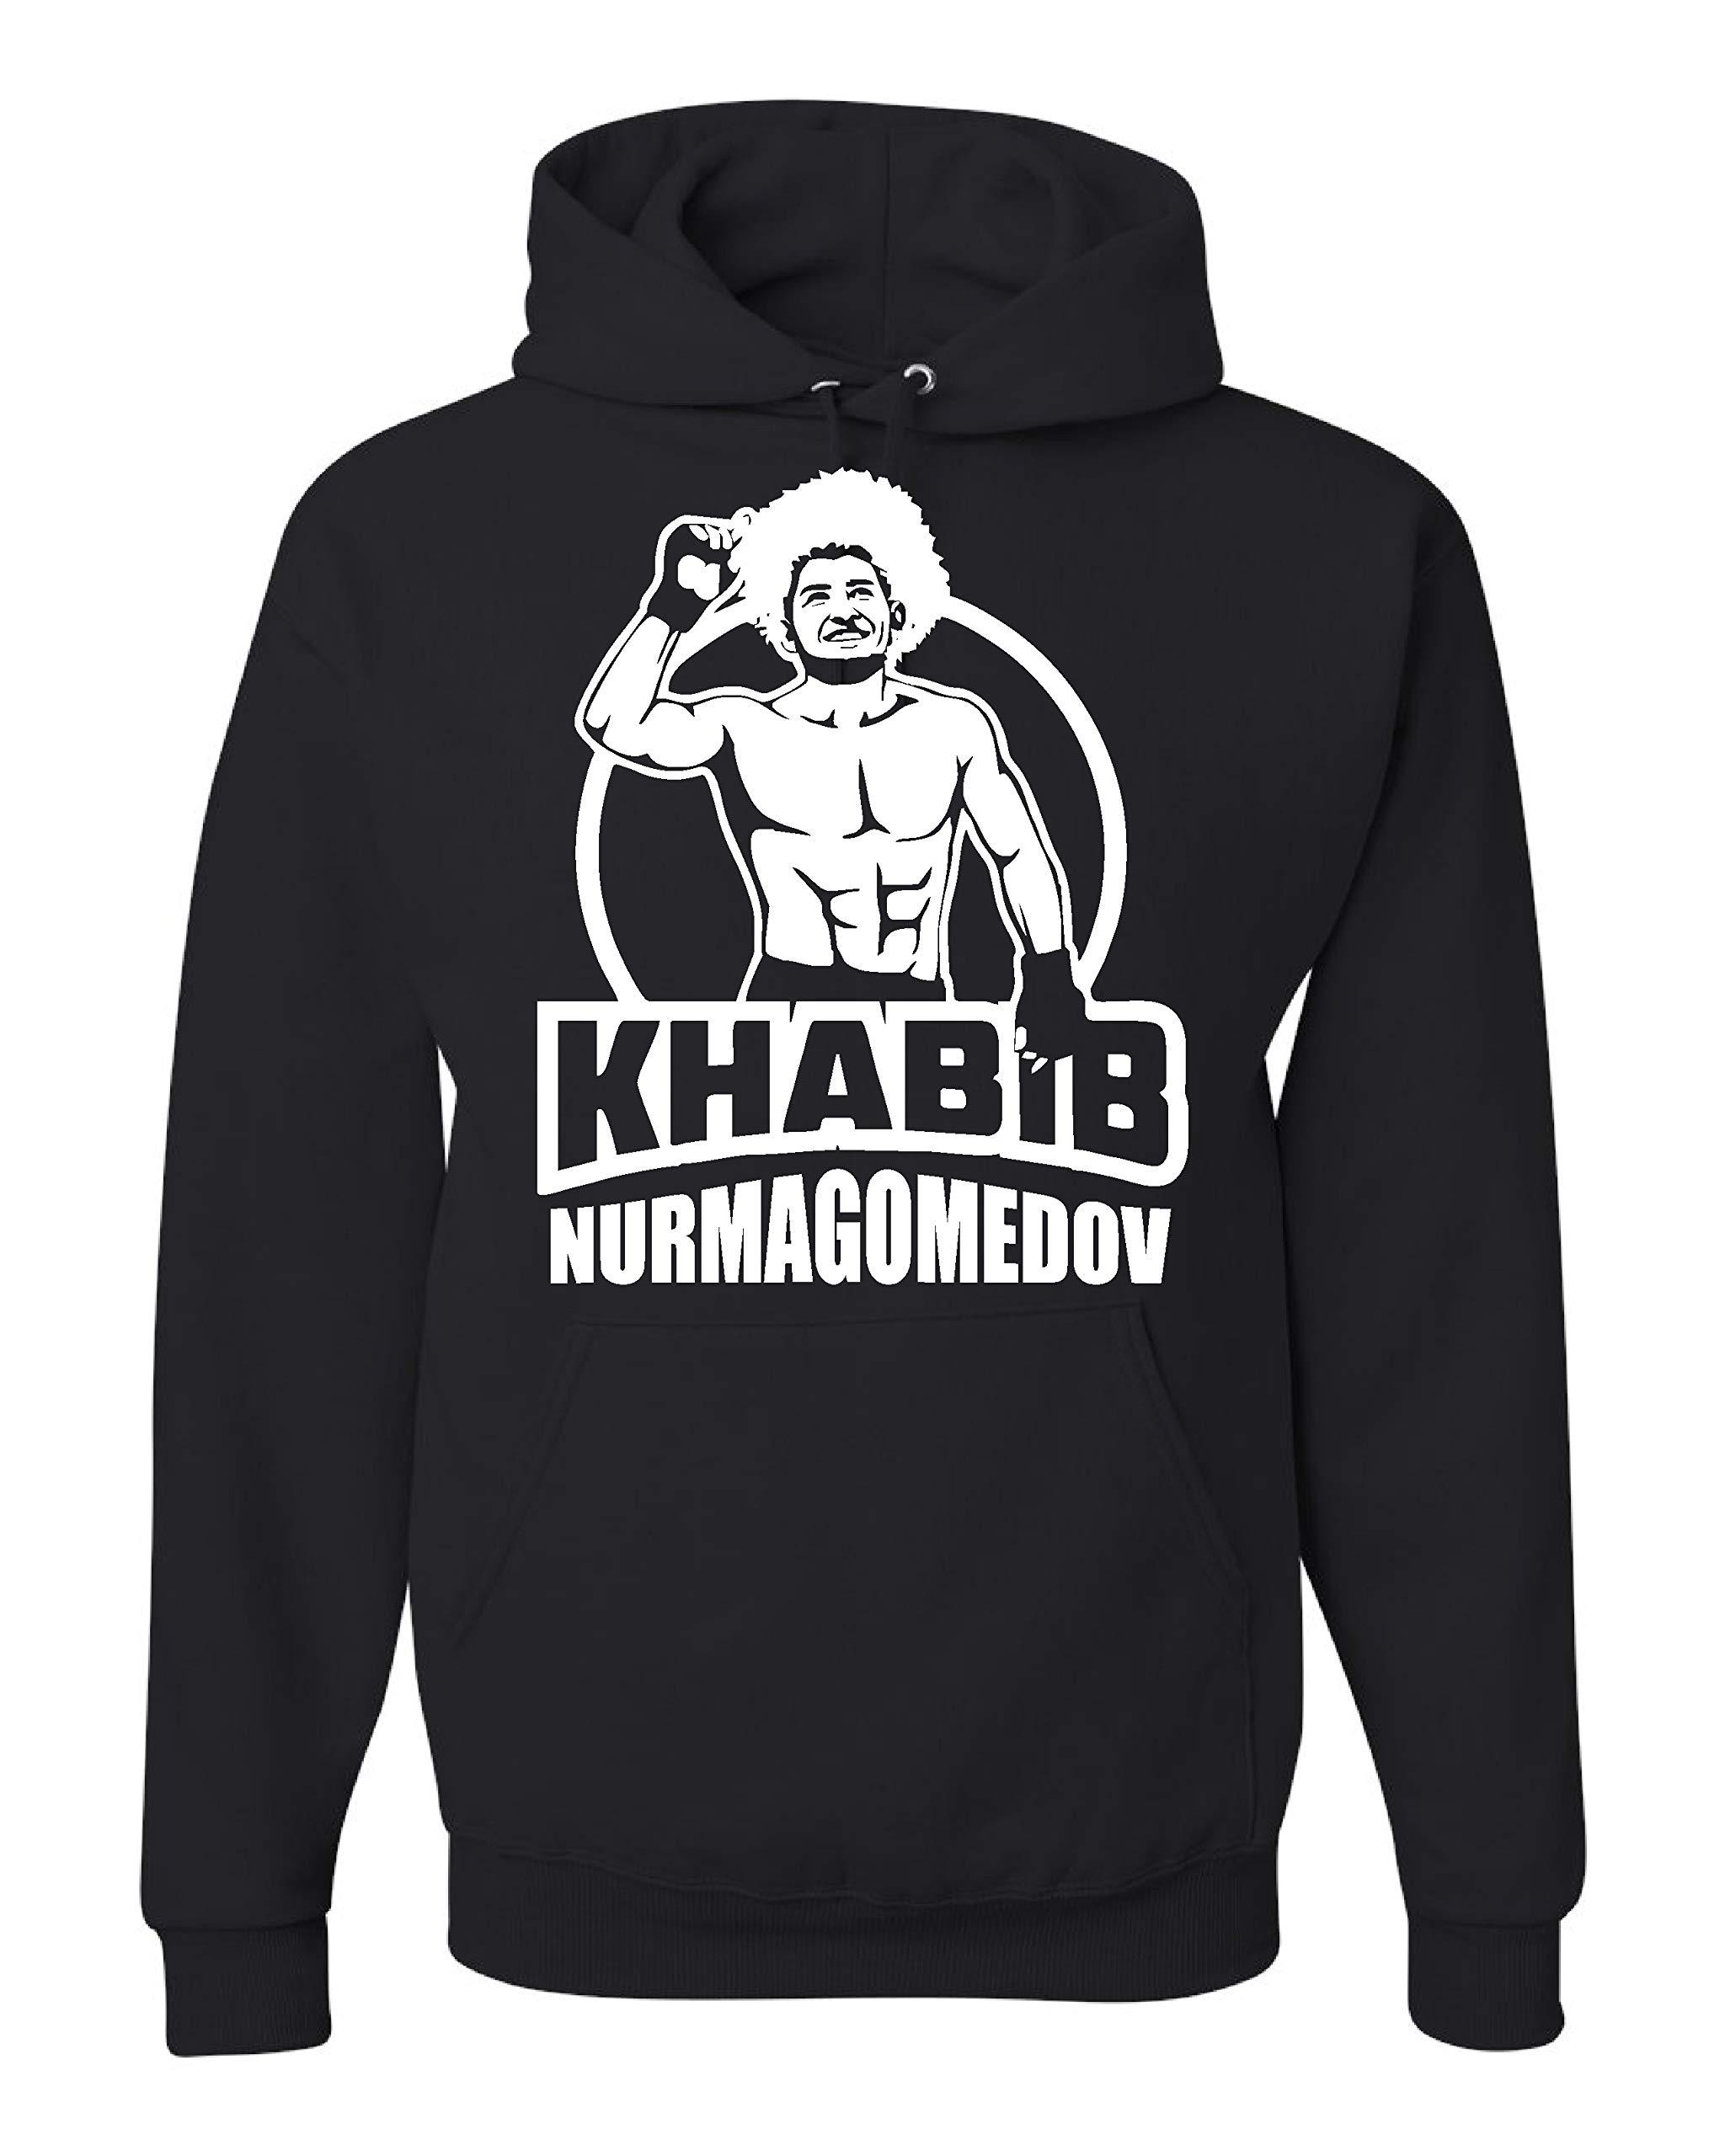 Khabib Nurmagomedov Ufc Hooded Shirts